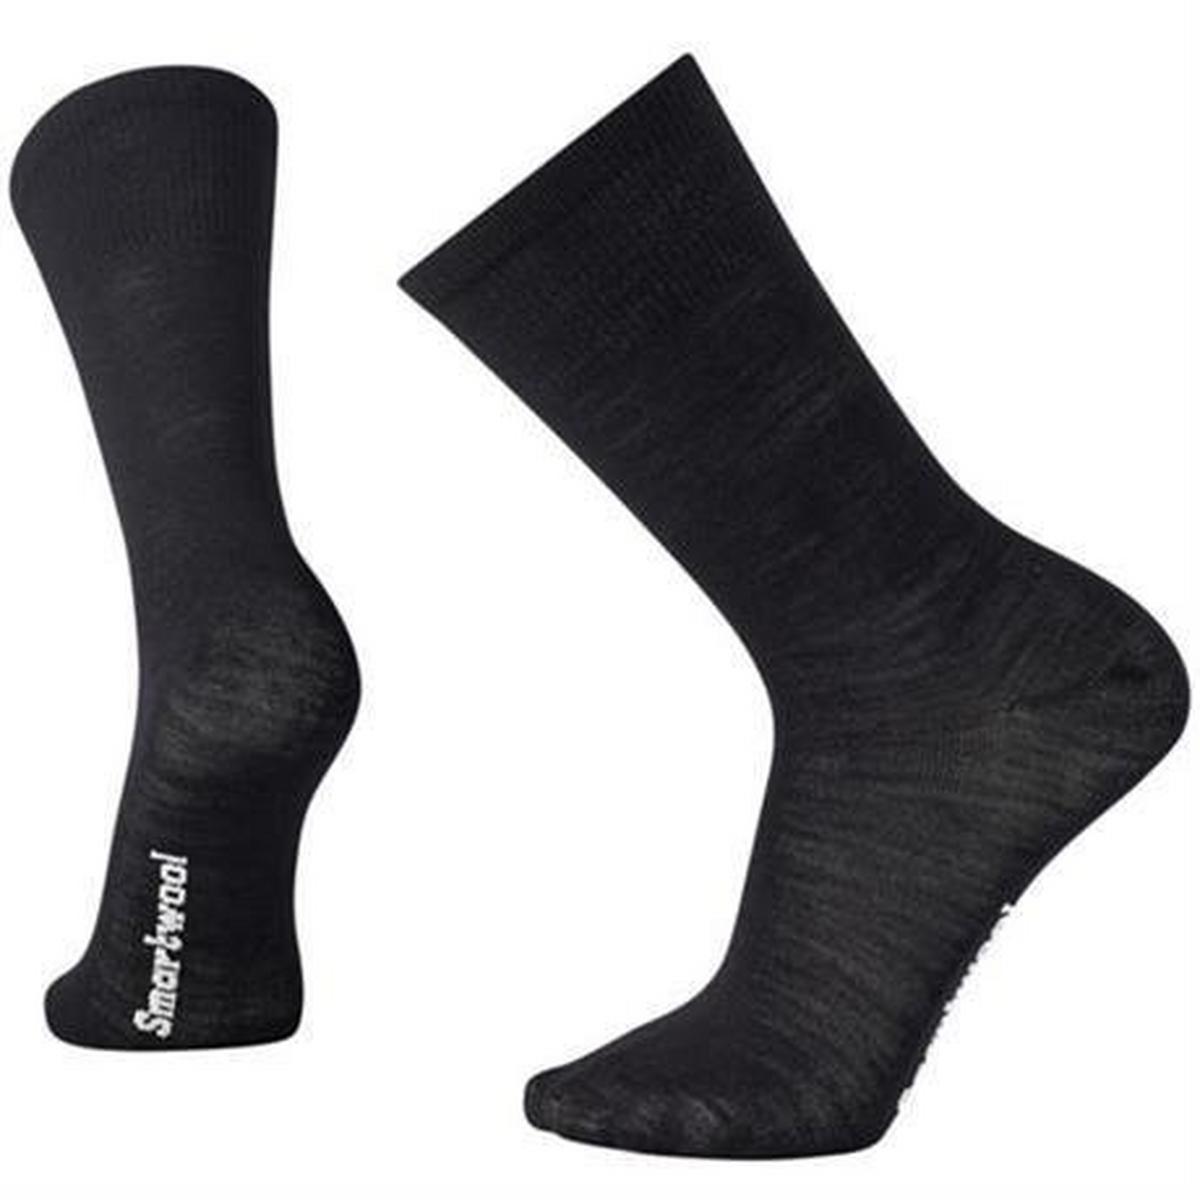 Smartwool HIKING Socks Men's Hike Liner Crew Black